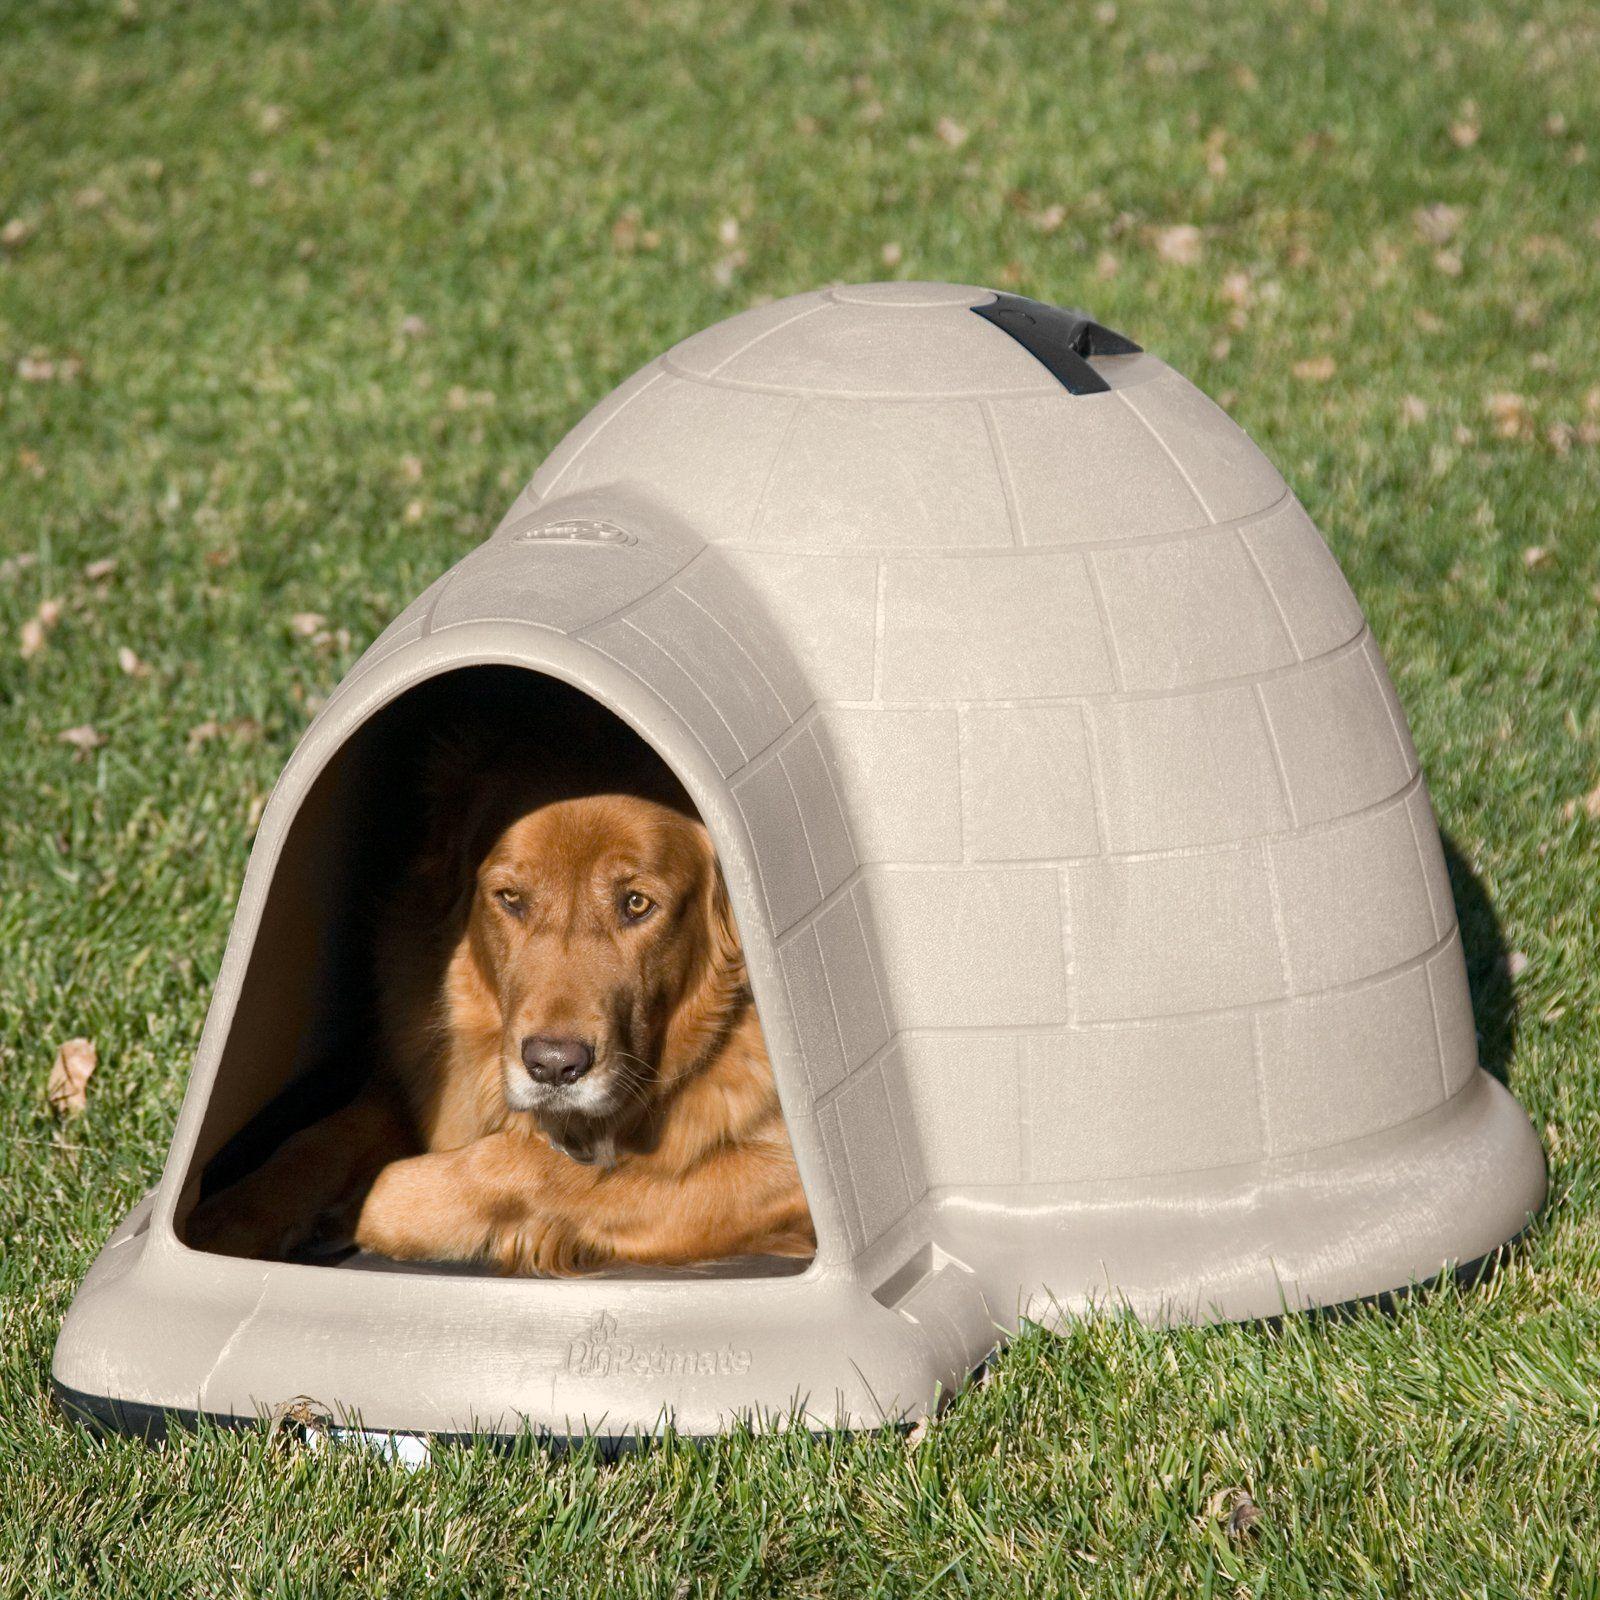 Have To Have It Petmate Indigo Dog House 87 99 Hayneedle Com